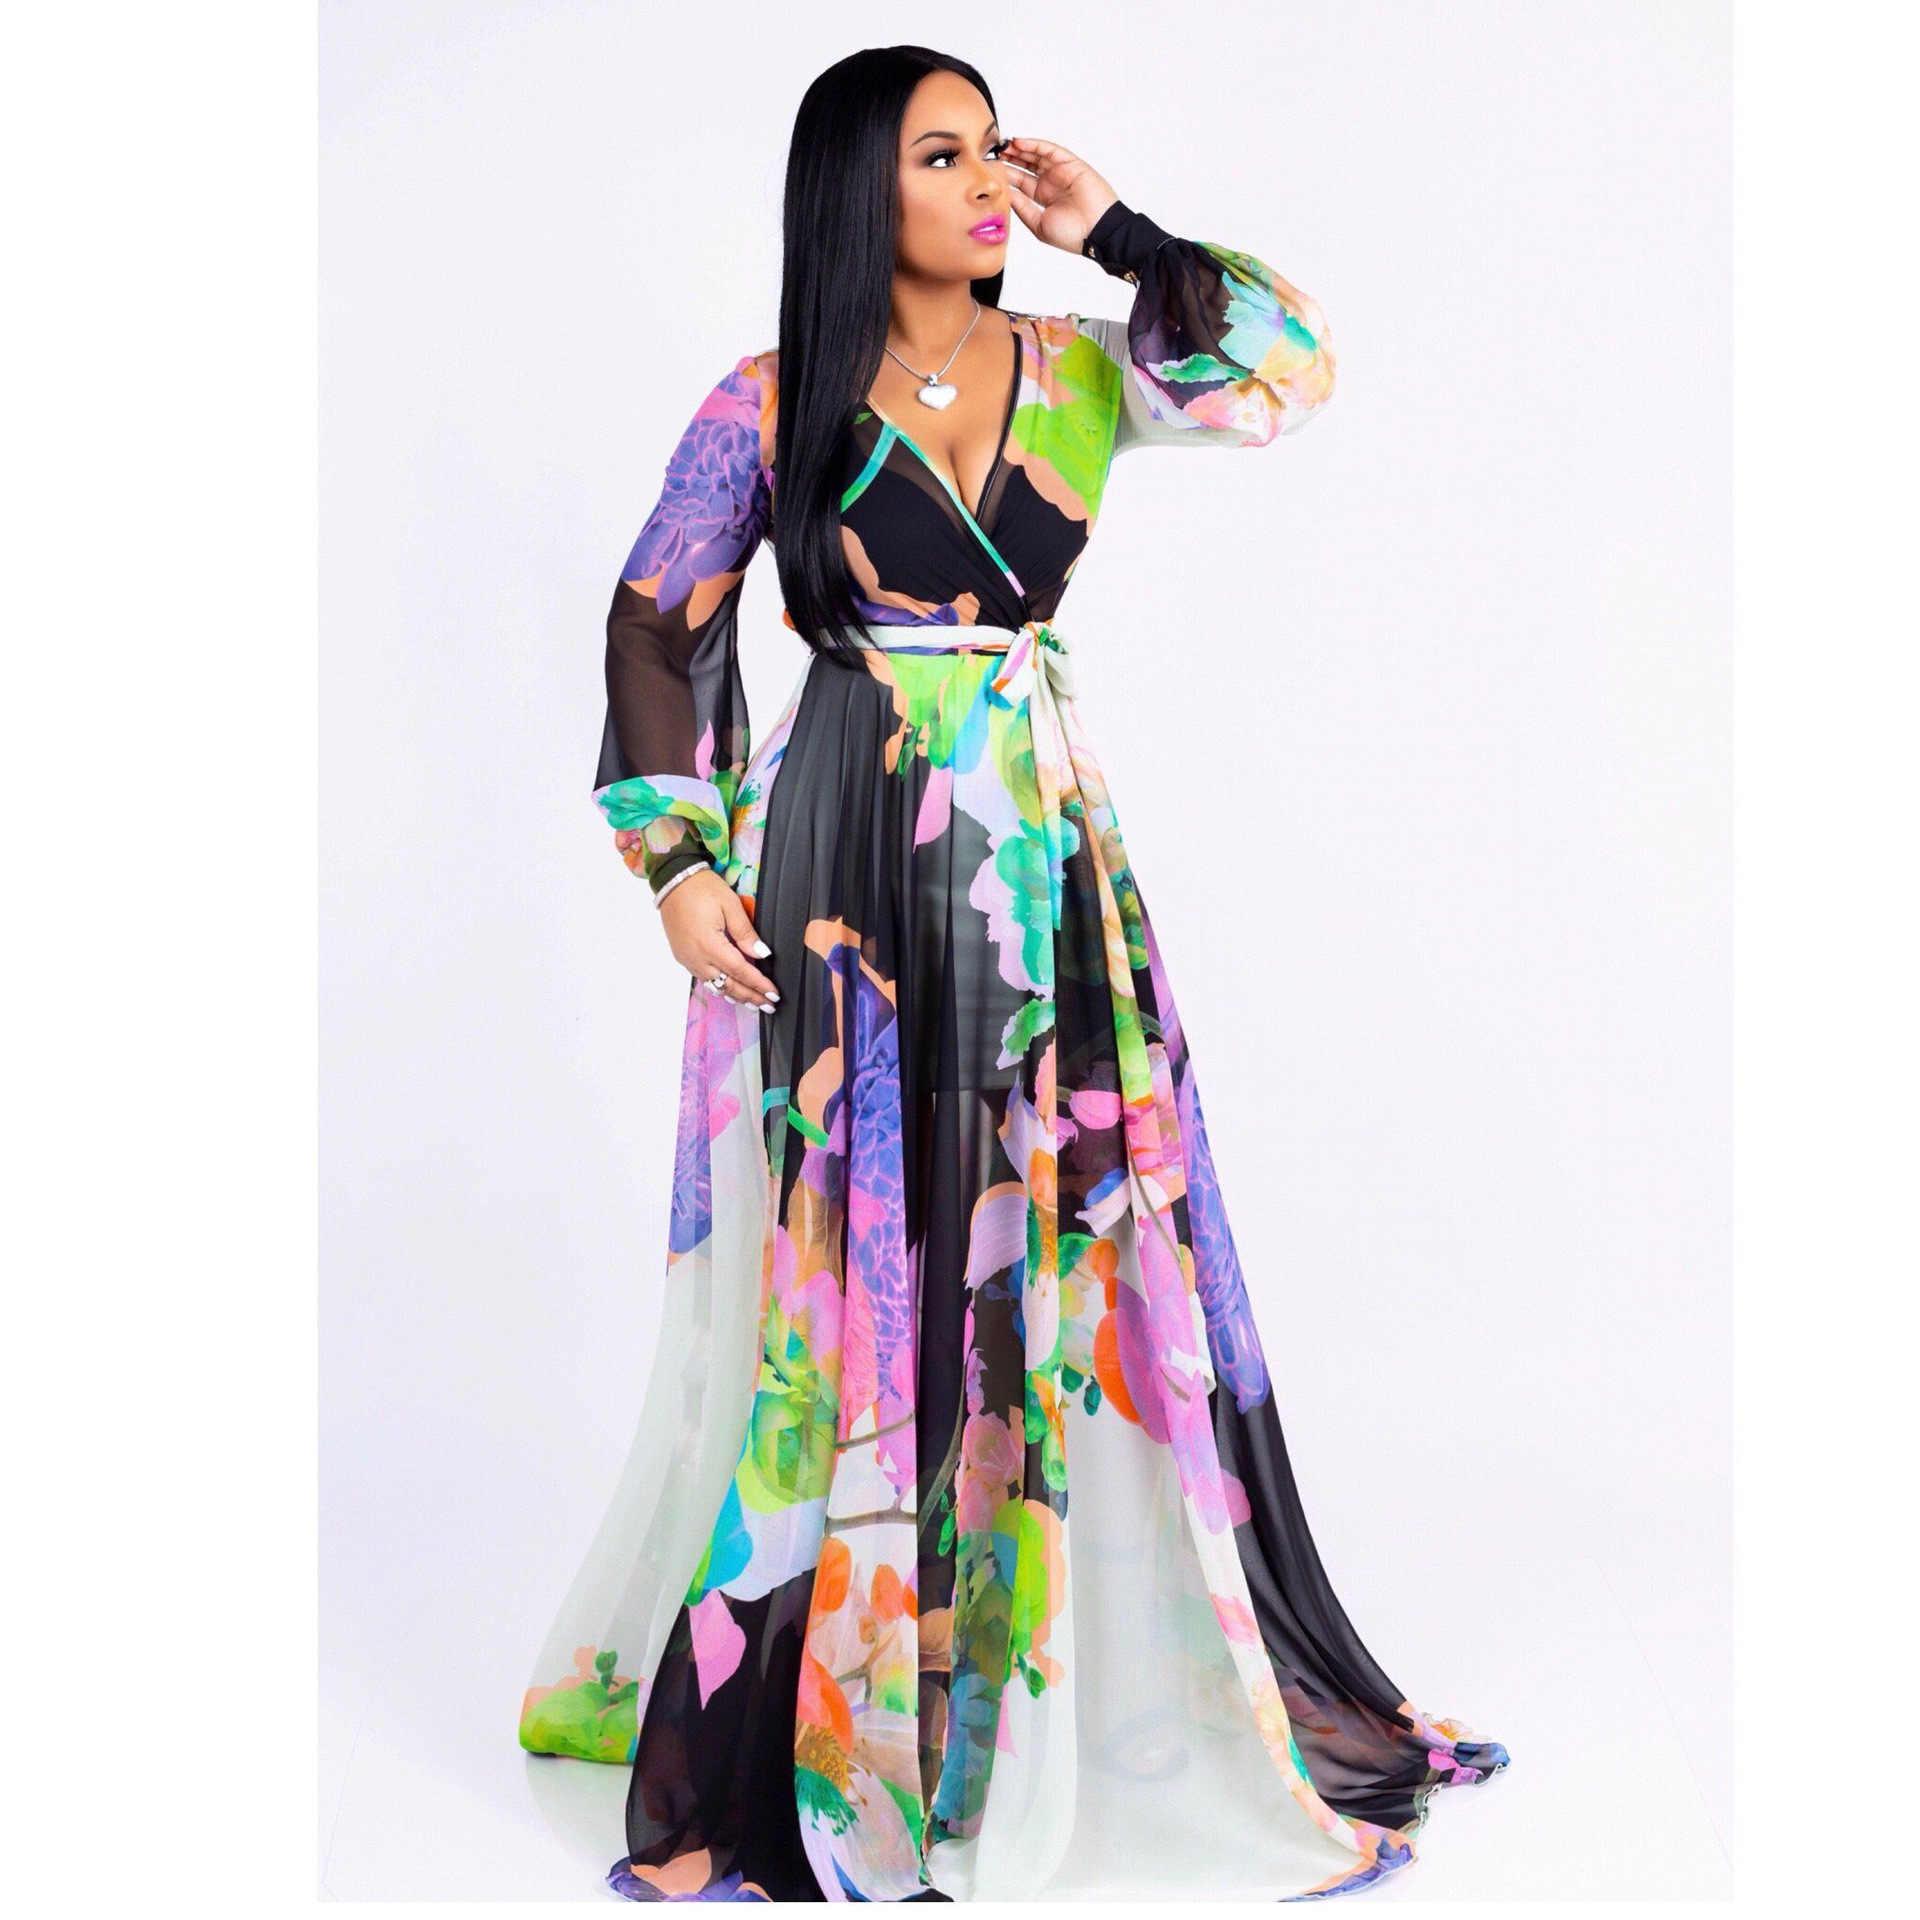 eef002d43b99b Detail Feedback Questions about 2018 Autumn Women Fashion Rainbow ...